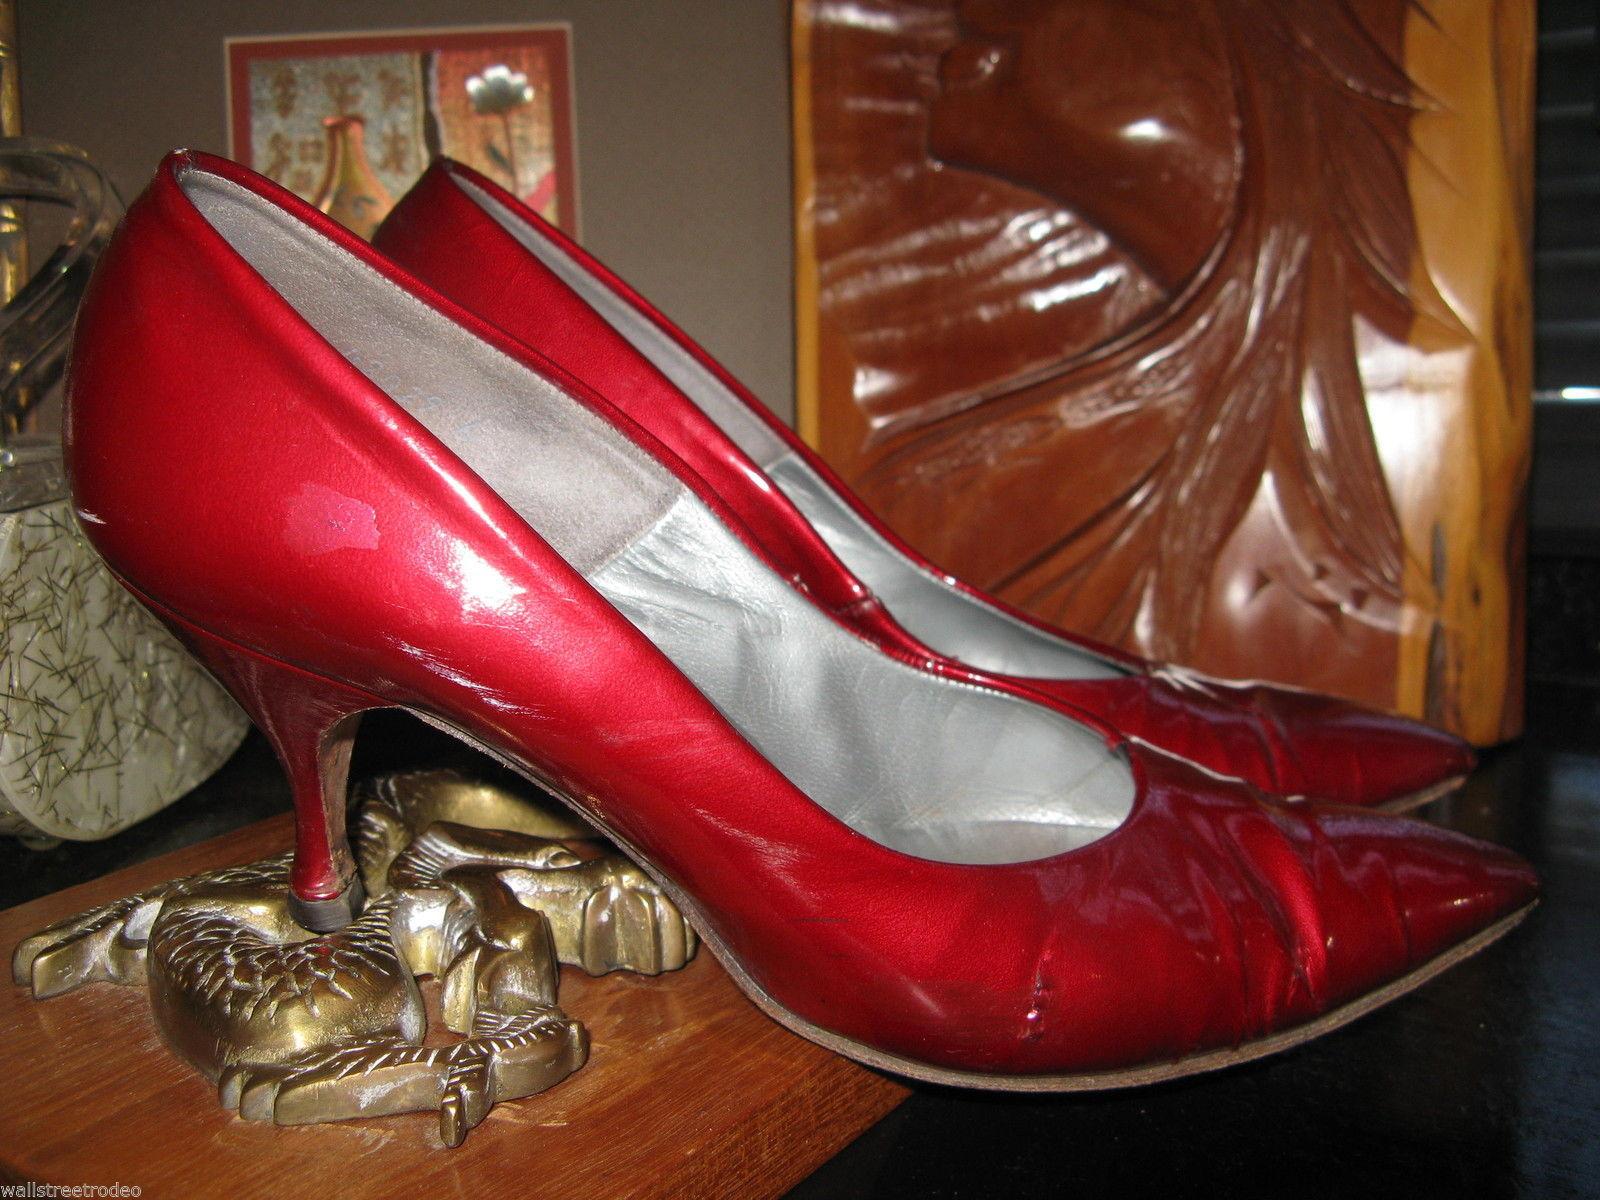 Smartaire vintage Debbie Renolds heels shoes 7 1/2 AAAA VLV 6 UK3.5 36 bonus VLV image 7